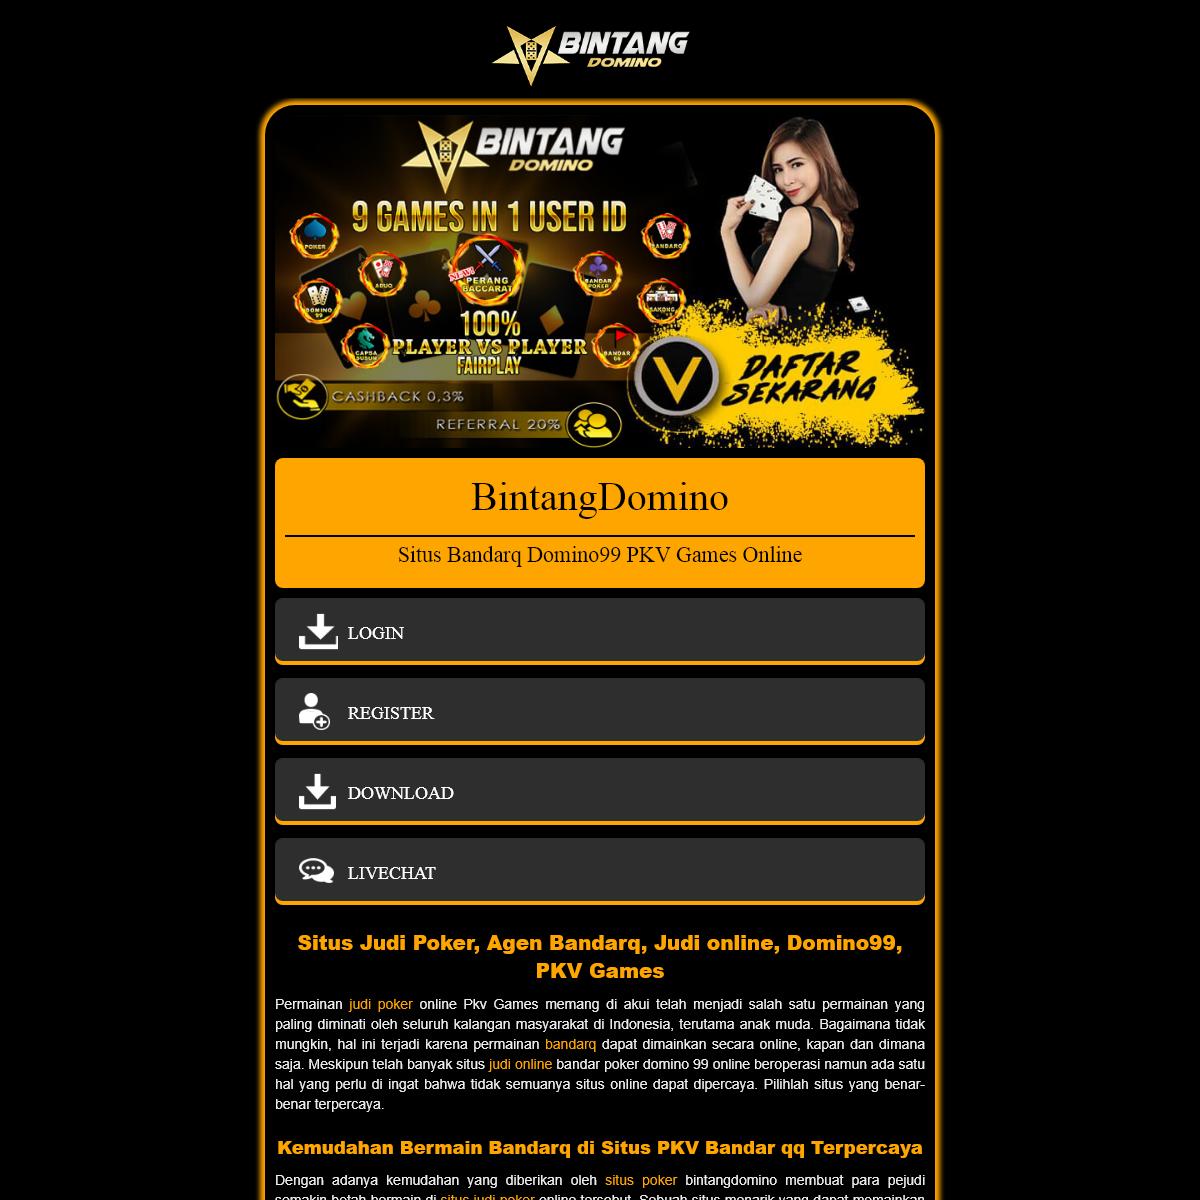 Situs Judi Poker, Agen Bandarq, Judi online, Domino99, PKV Games